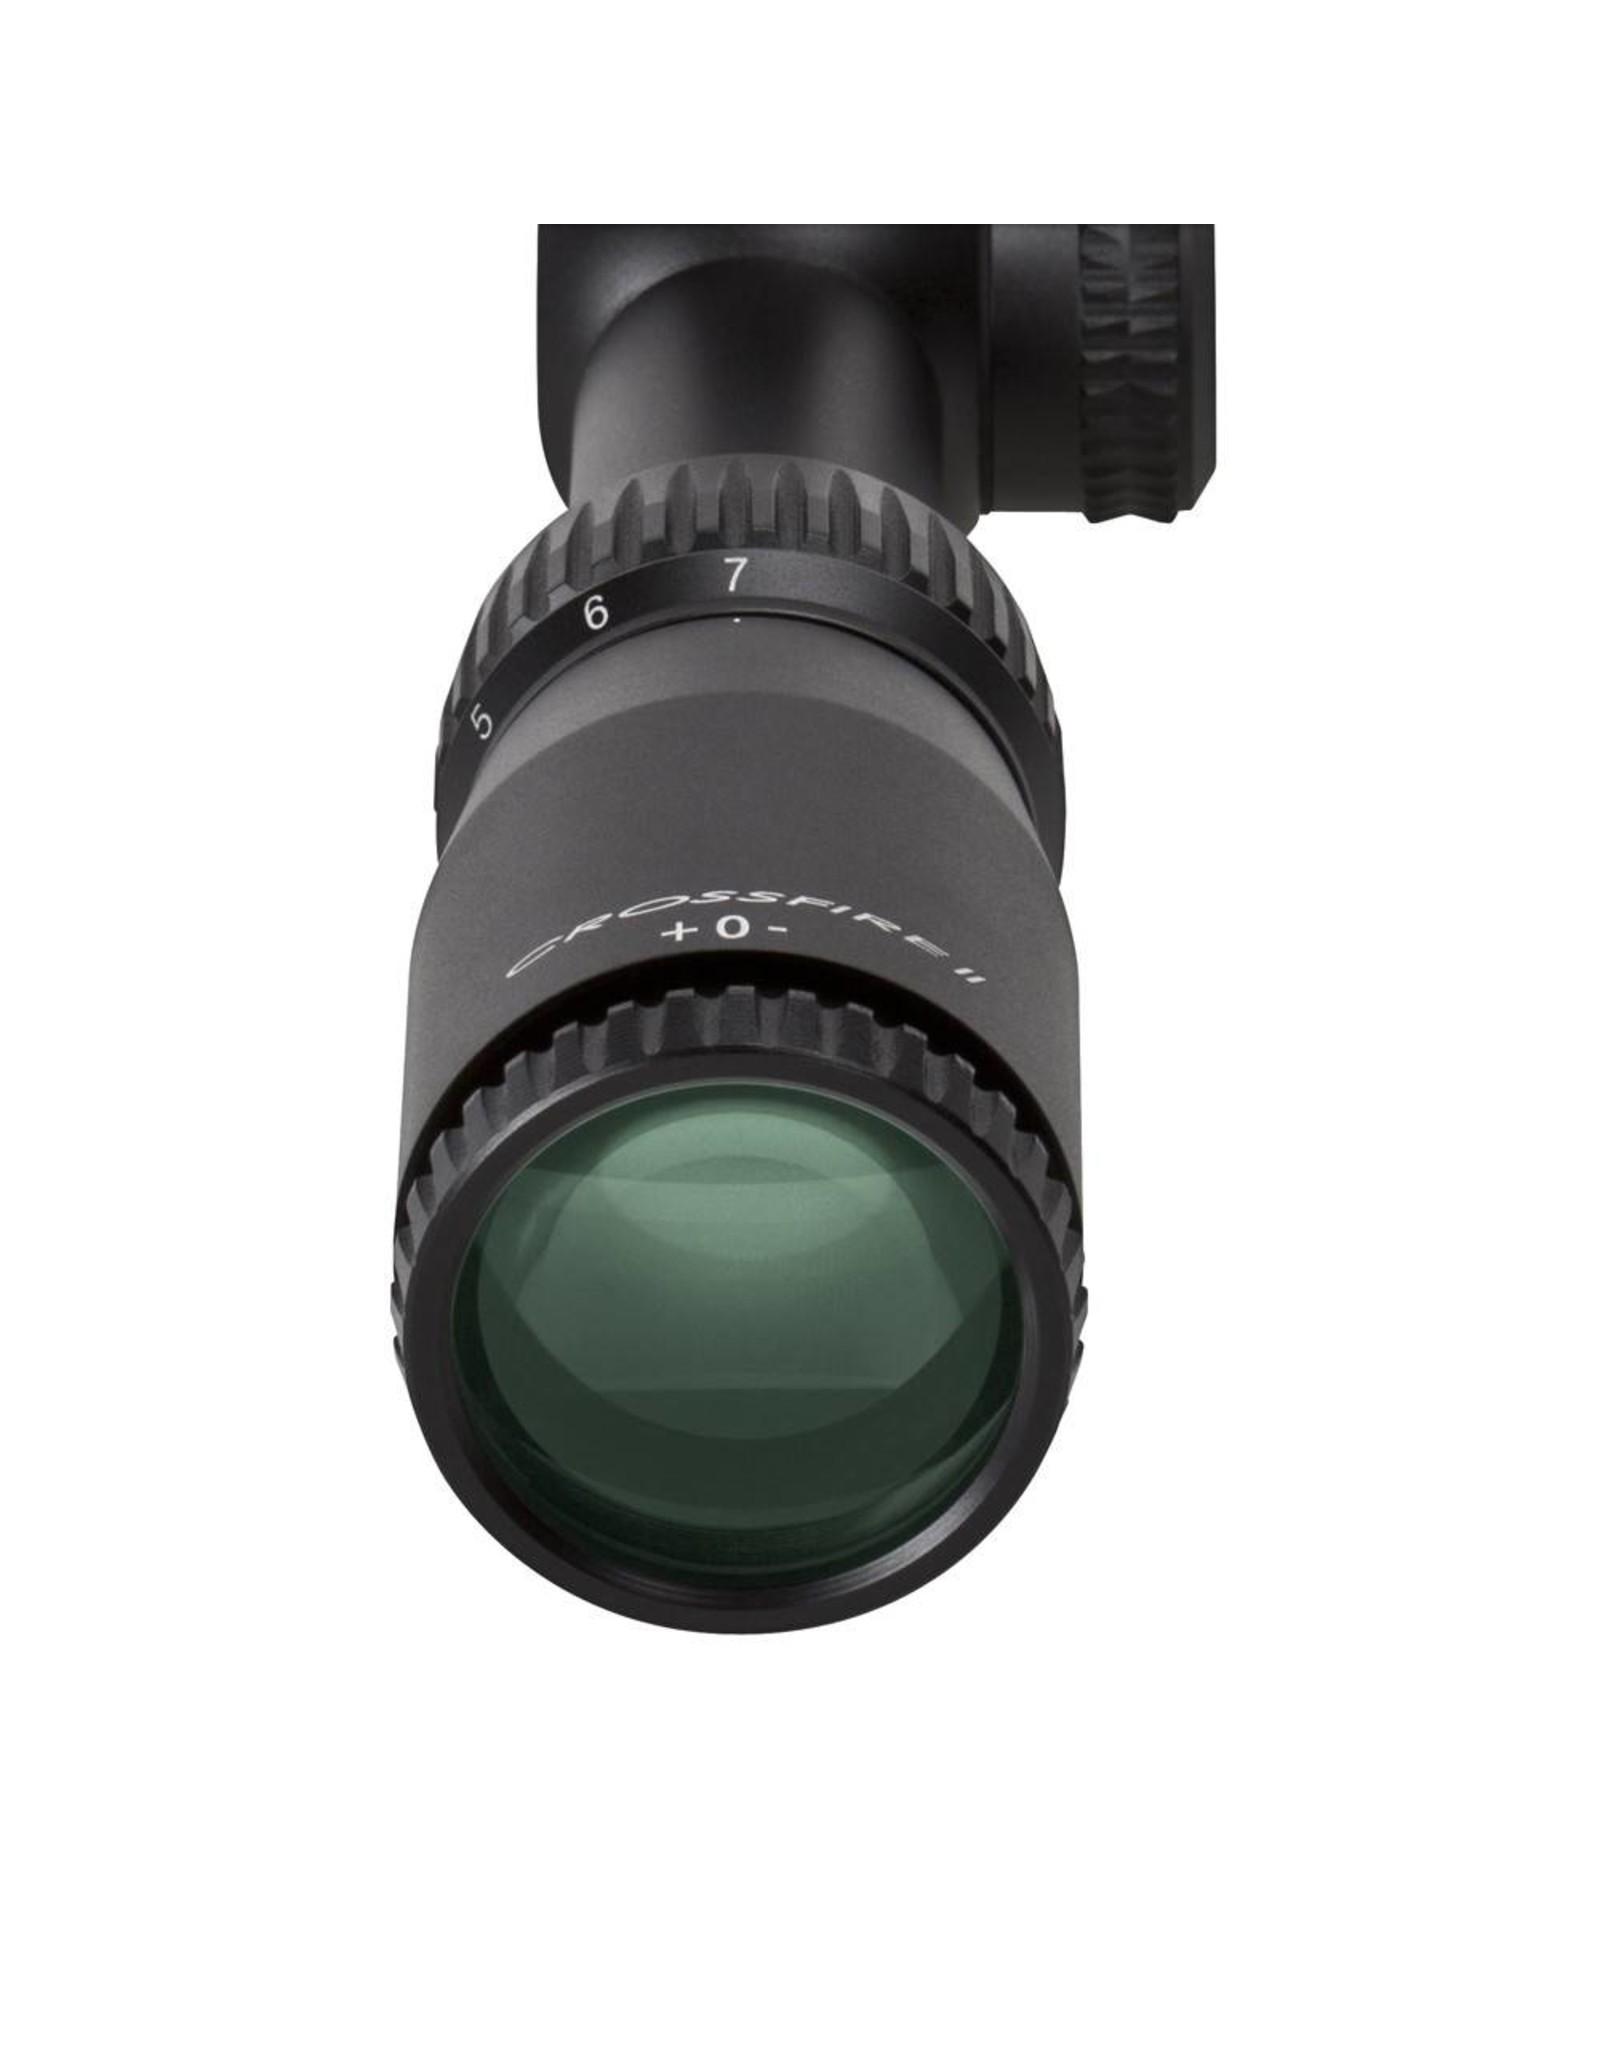 Vortex Vortex Crossfire II 2-7x32 Rimfire Riflescope 1-Inch V-Plex